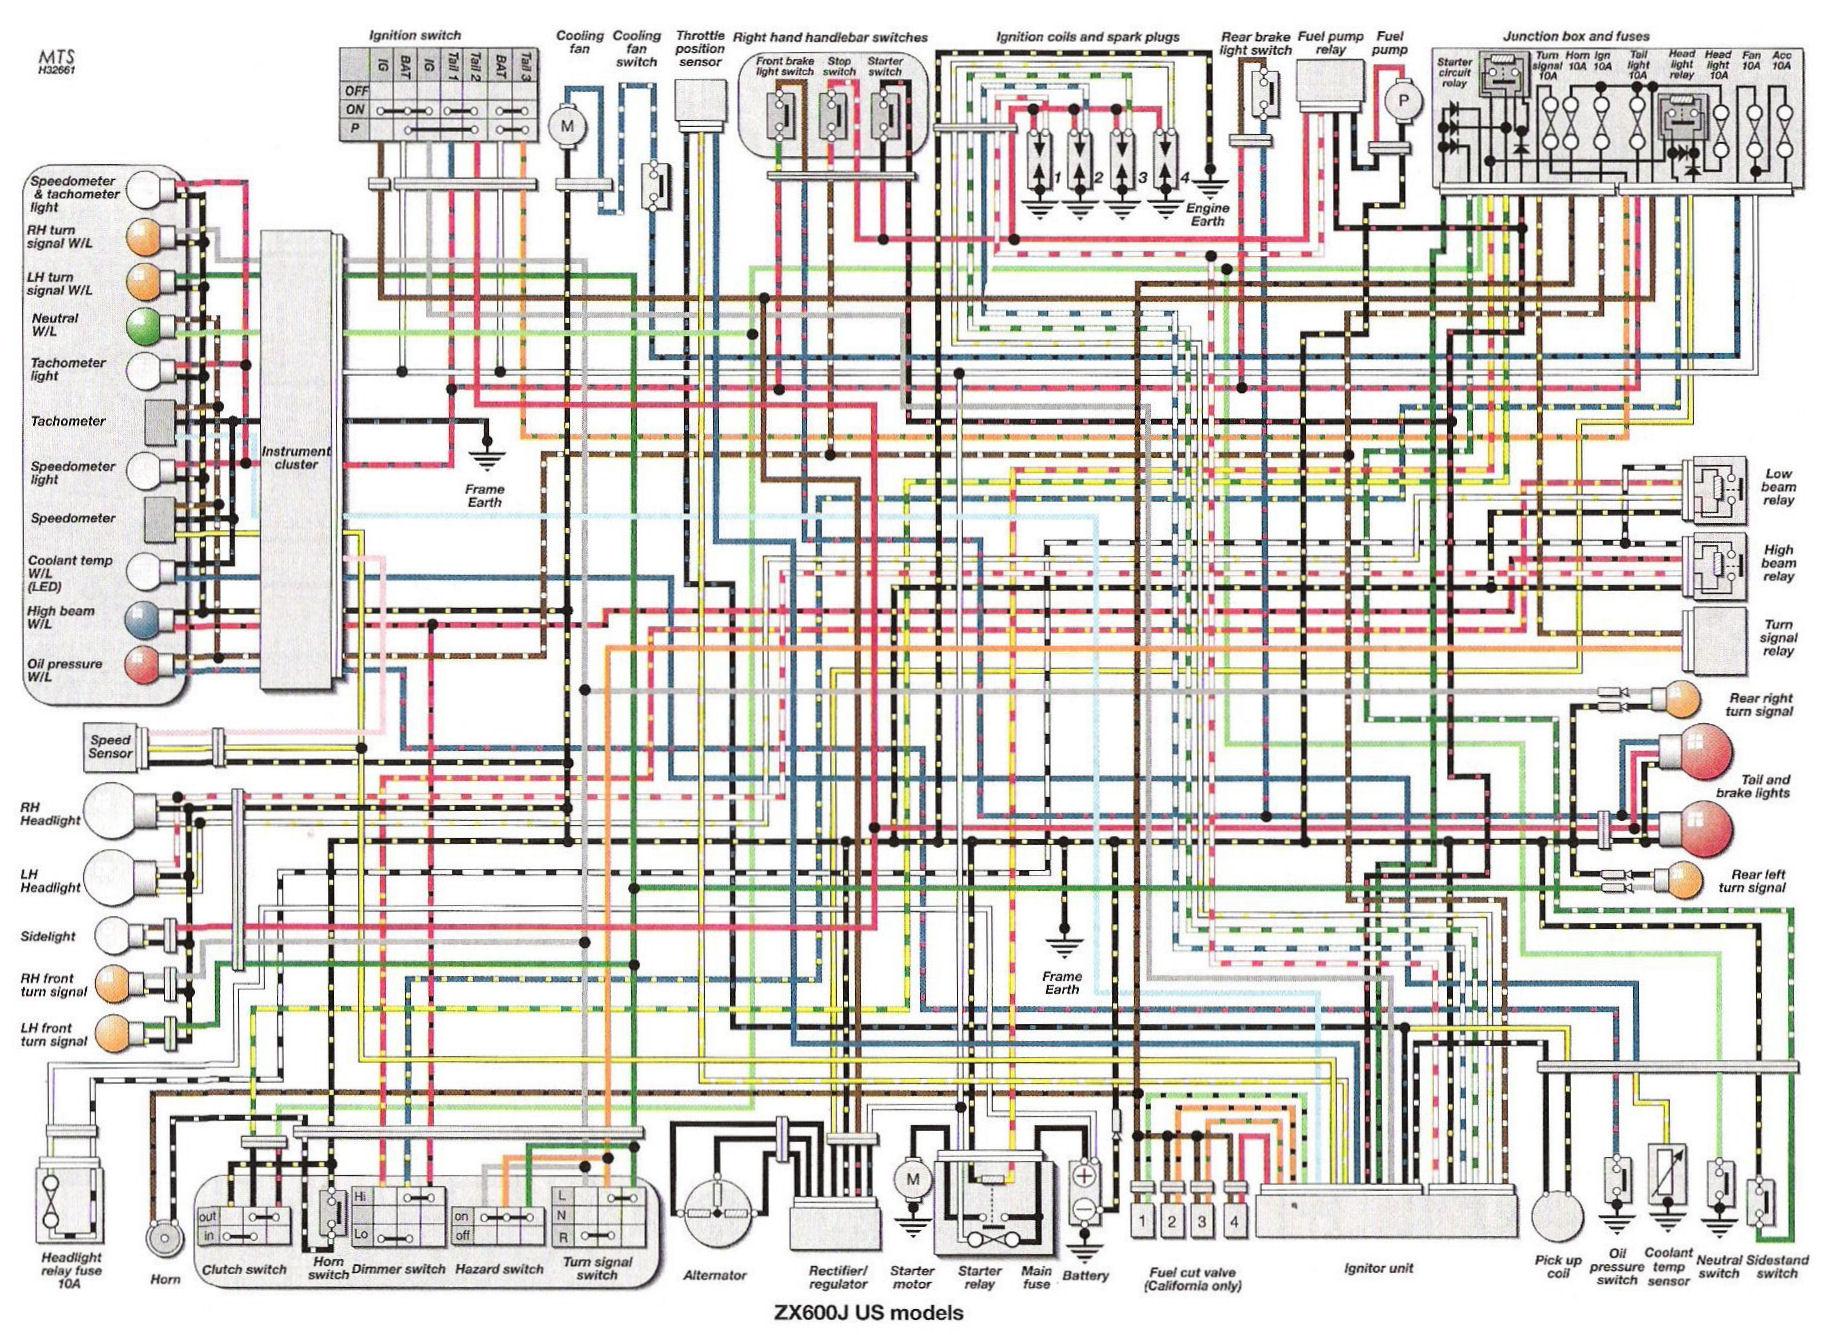 R6 Wiring Diagram In Addition Yamaha Wiring Diagram Moreover Diagram